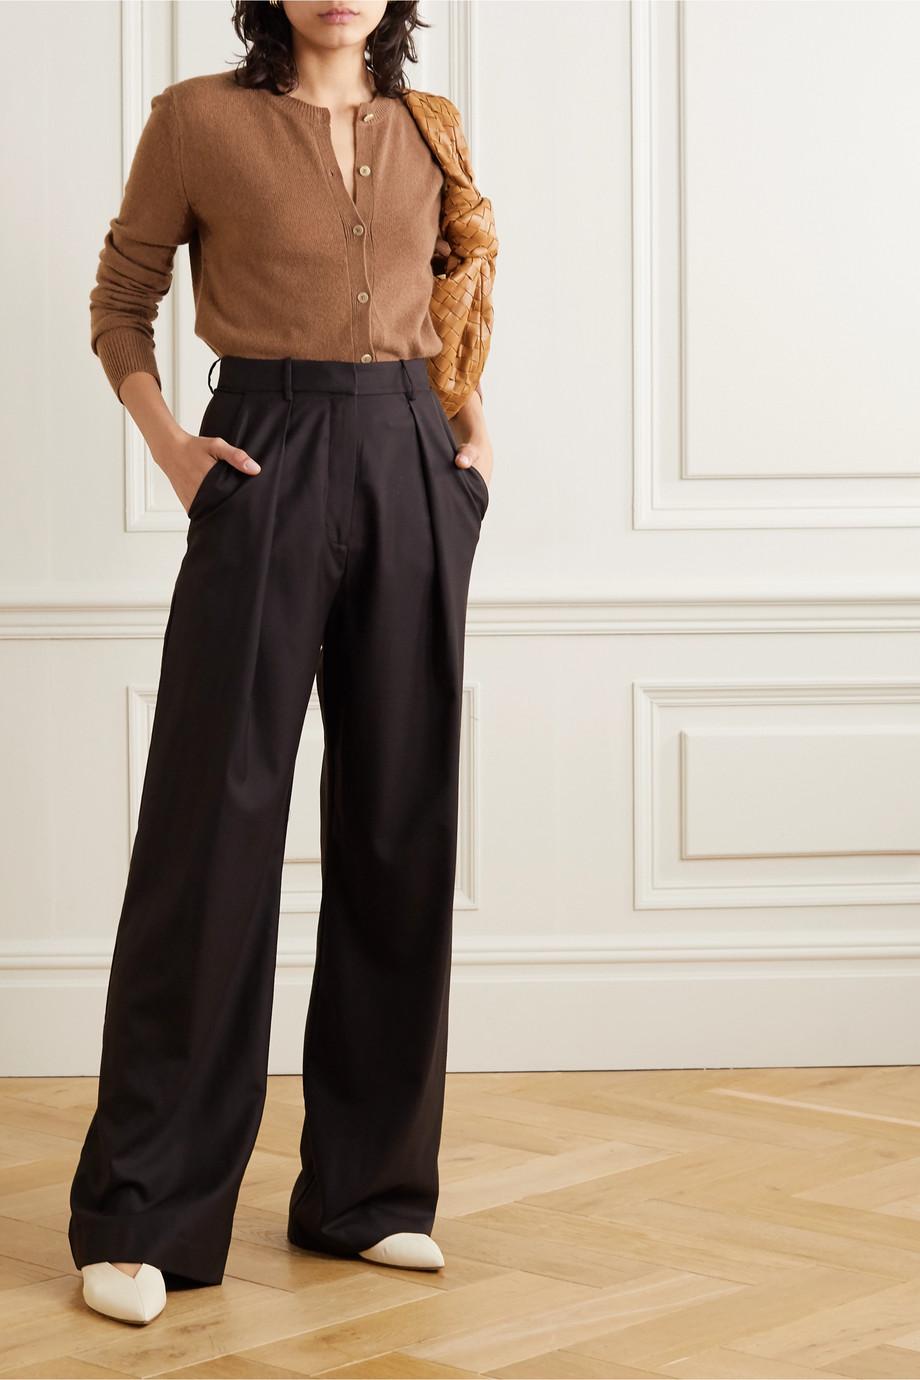 The Row Annamaria cashmere cardigan